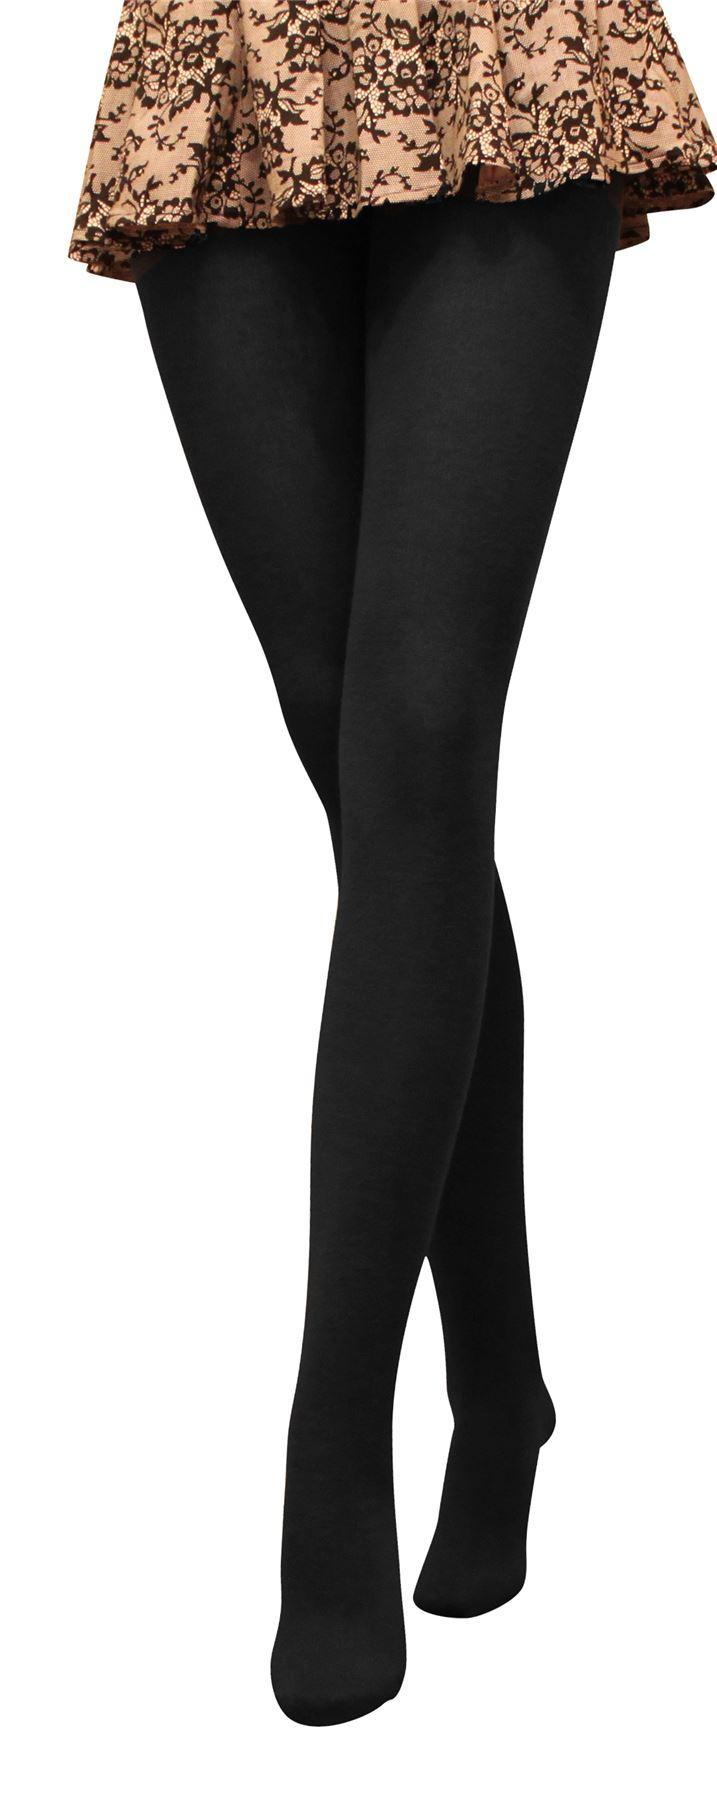 Warm-Winter-Tights-180-den-Acrylic-Size-2-5-New-Ladies-Women-Tights